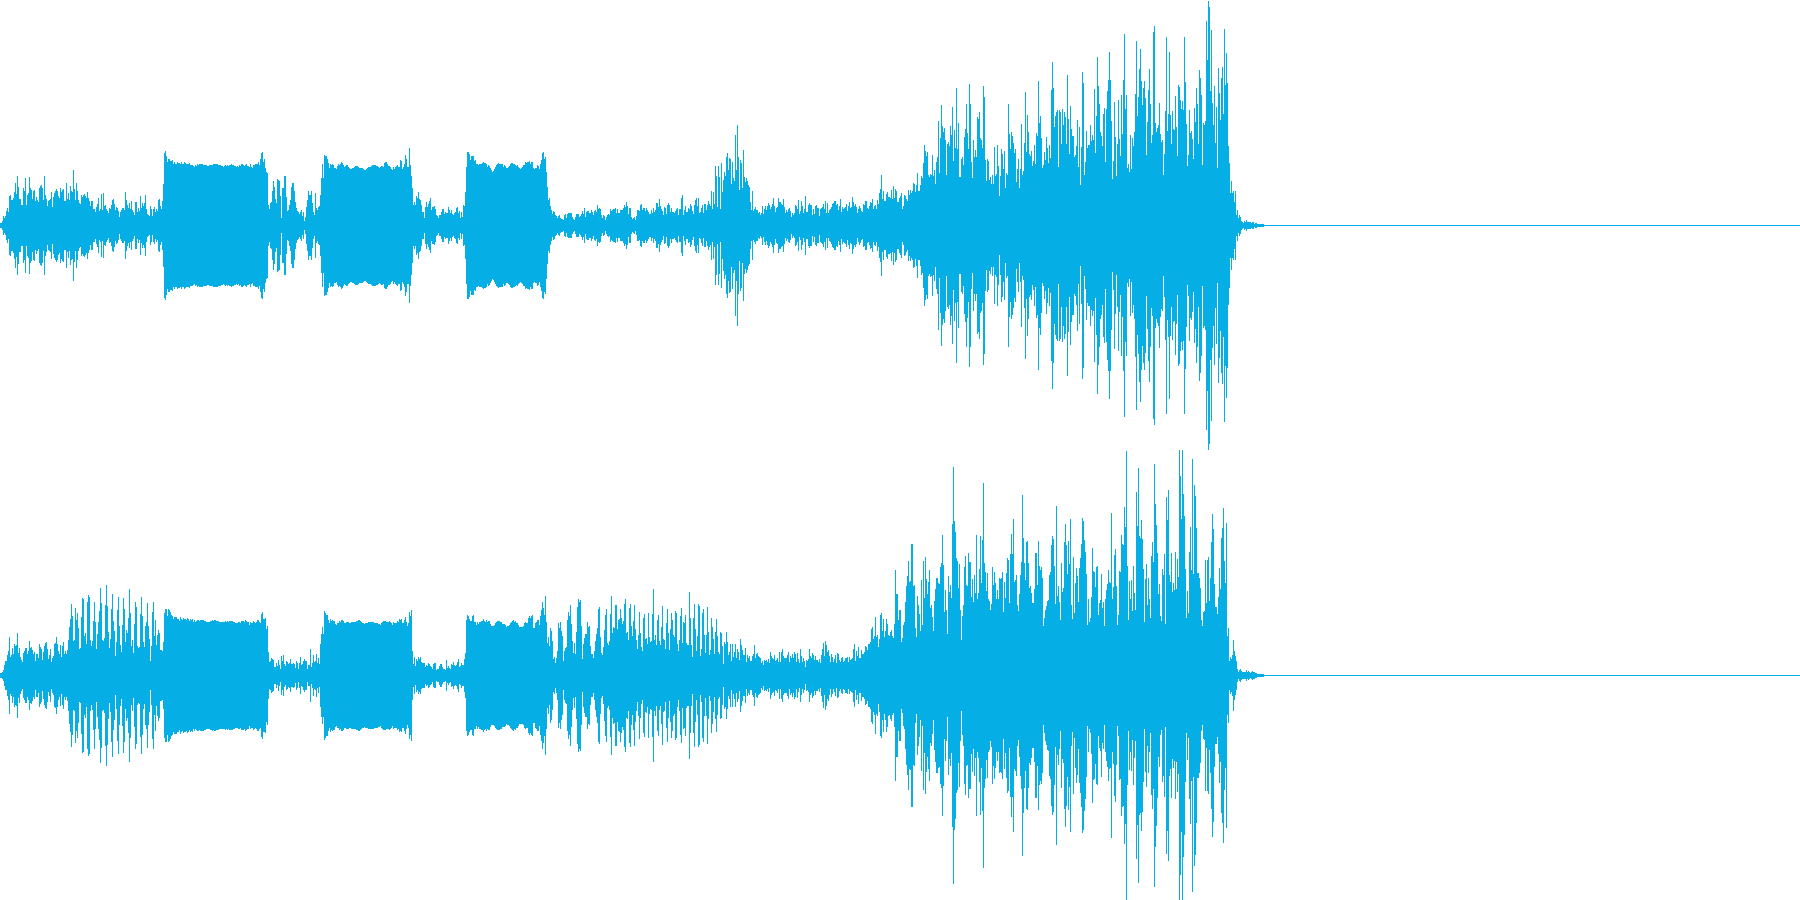 【SE 効果音】スクラッチ2の再生済みの波形